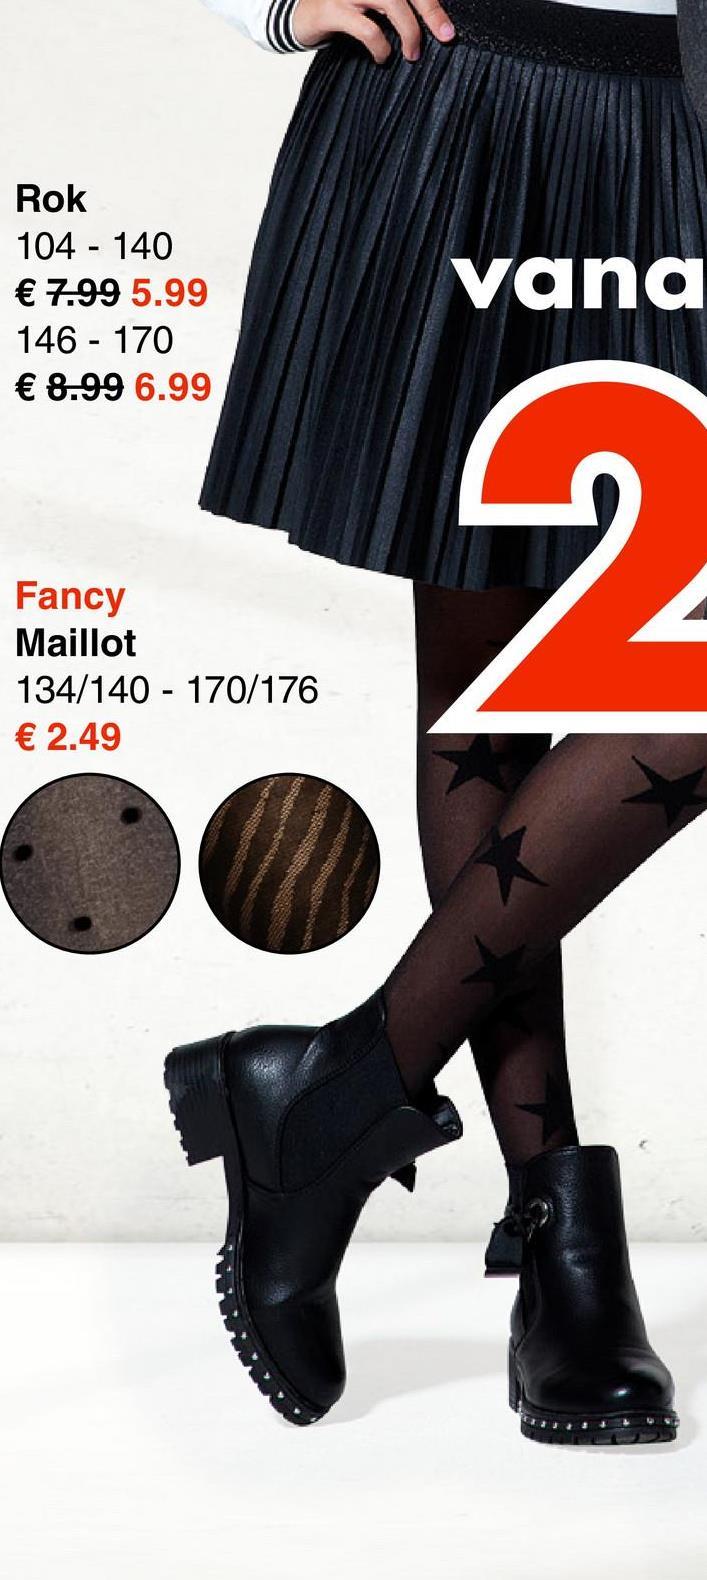 Rok 104 - 140 € 7.99 5.99 146 - 170 € 8.99 6.99 vana Nii Fancy Maillot 134/140 - 170/176 € 2.49